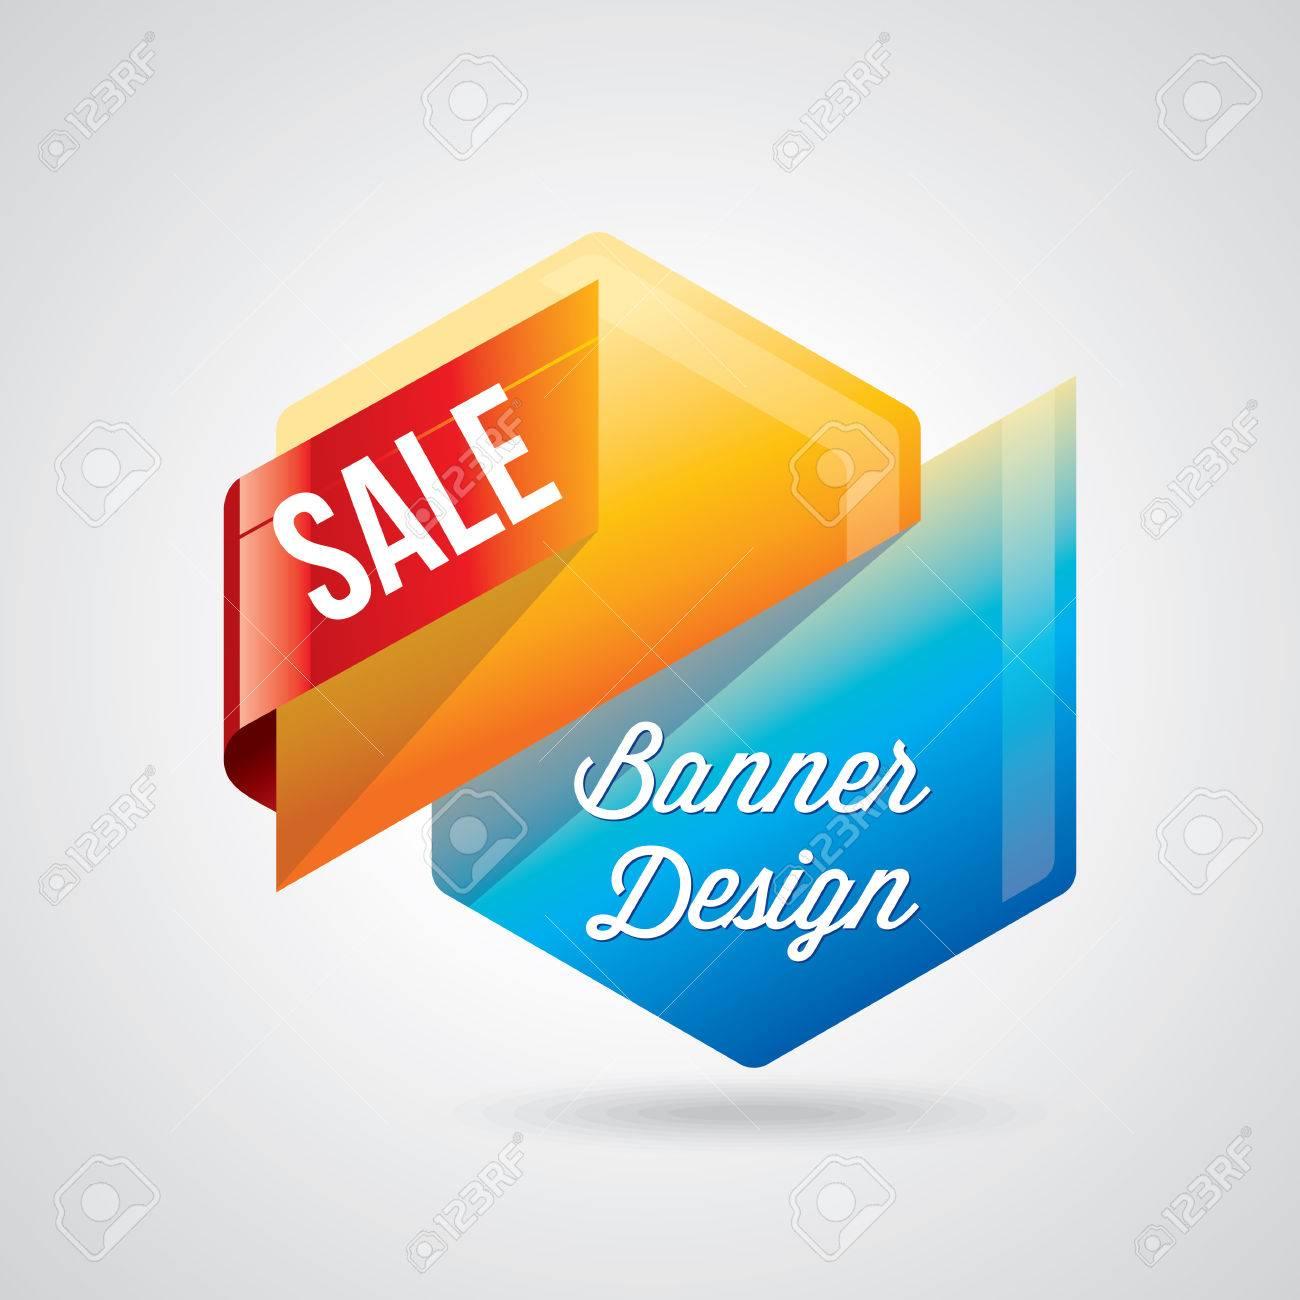 Colorful promotional banner design vector illustration - 41602758